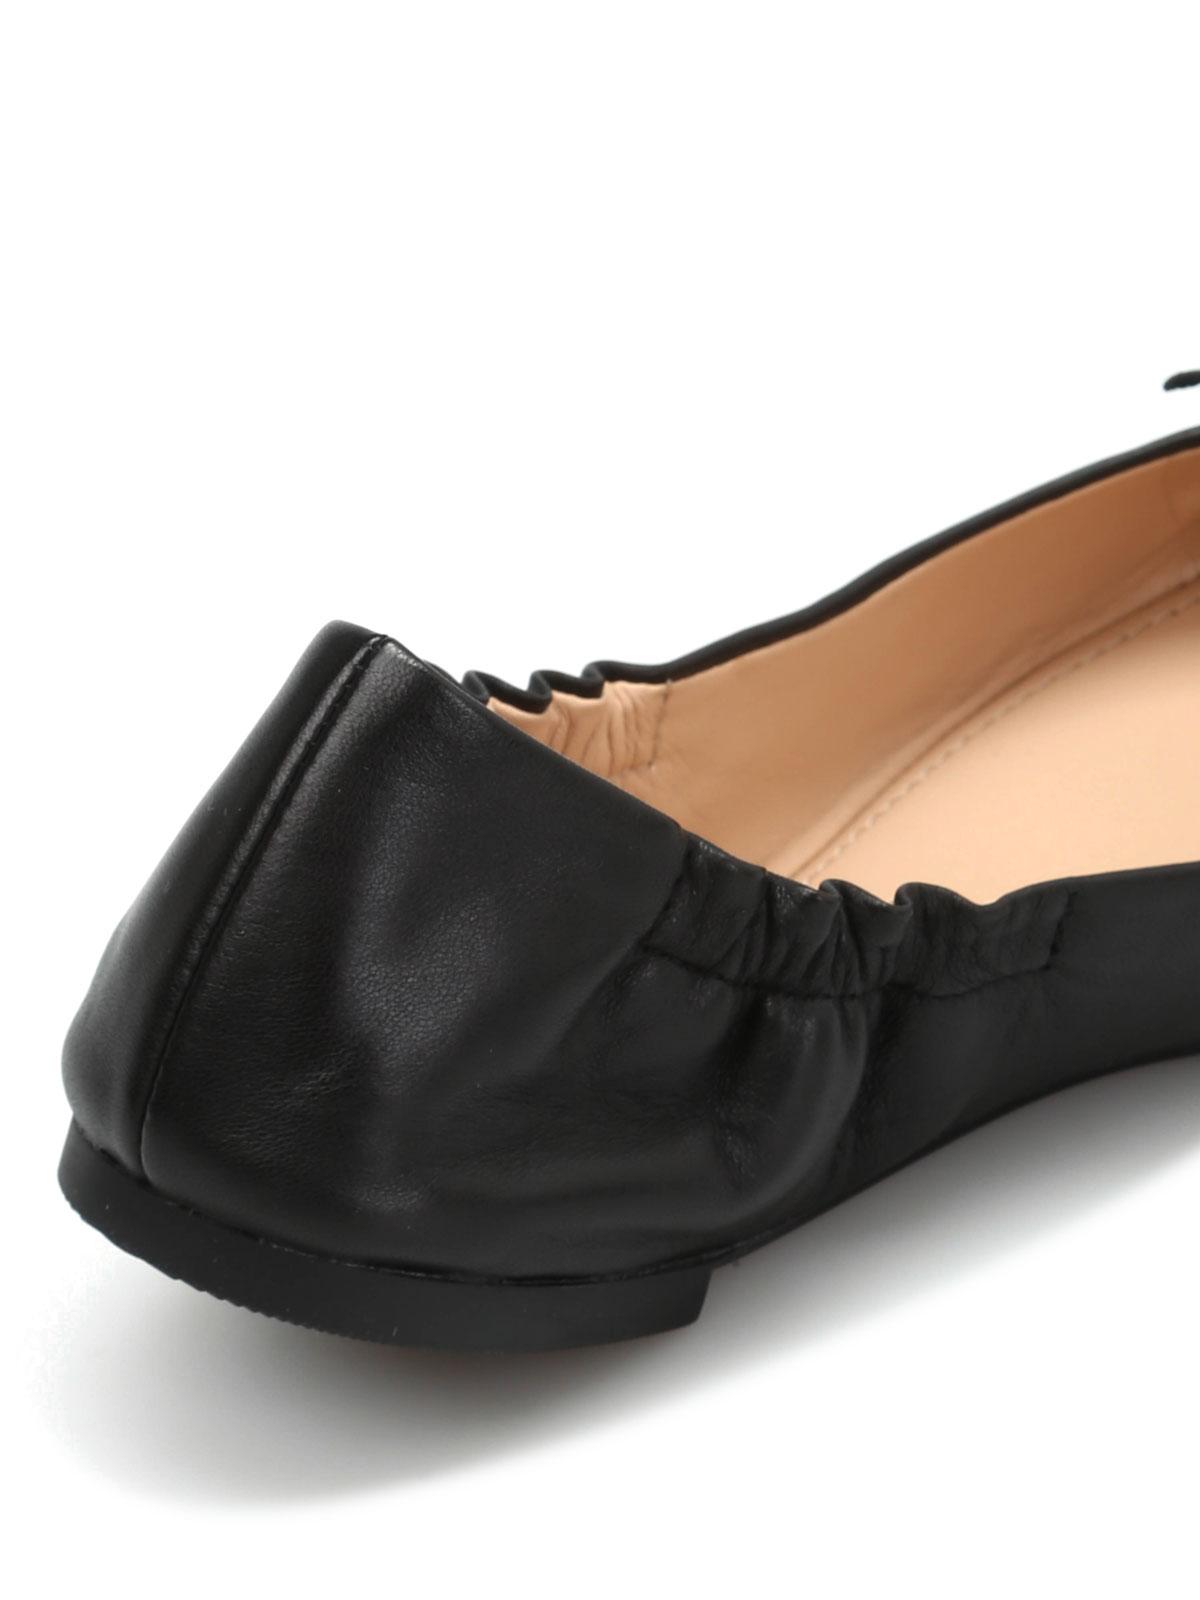 88f516e2127c Tory Burch - Blossom Ballet flats - flat shoes - 32458001